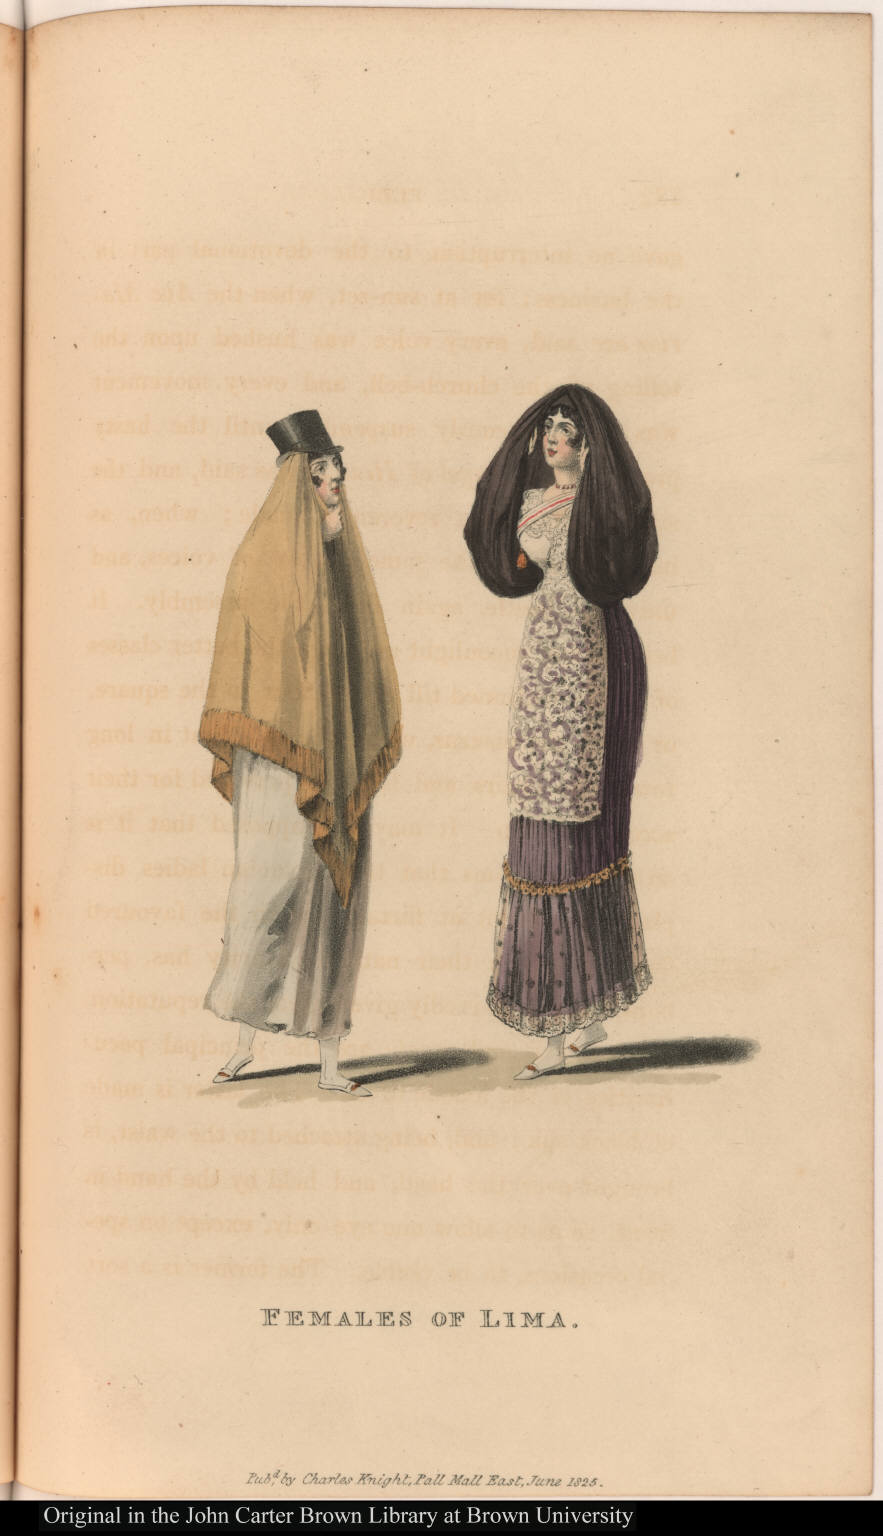 Females of Lima.